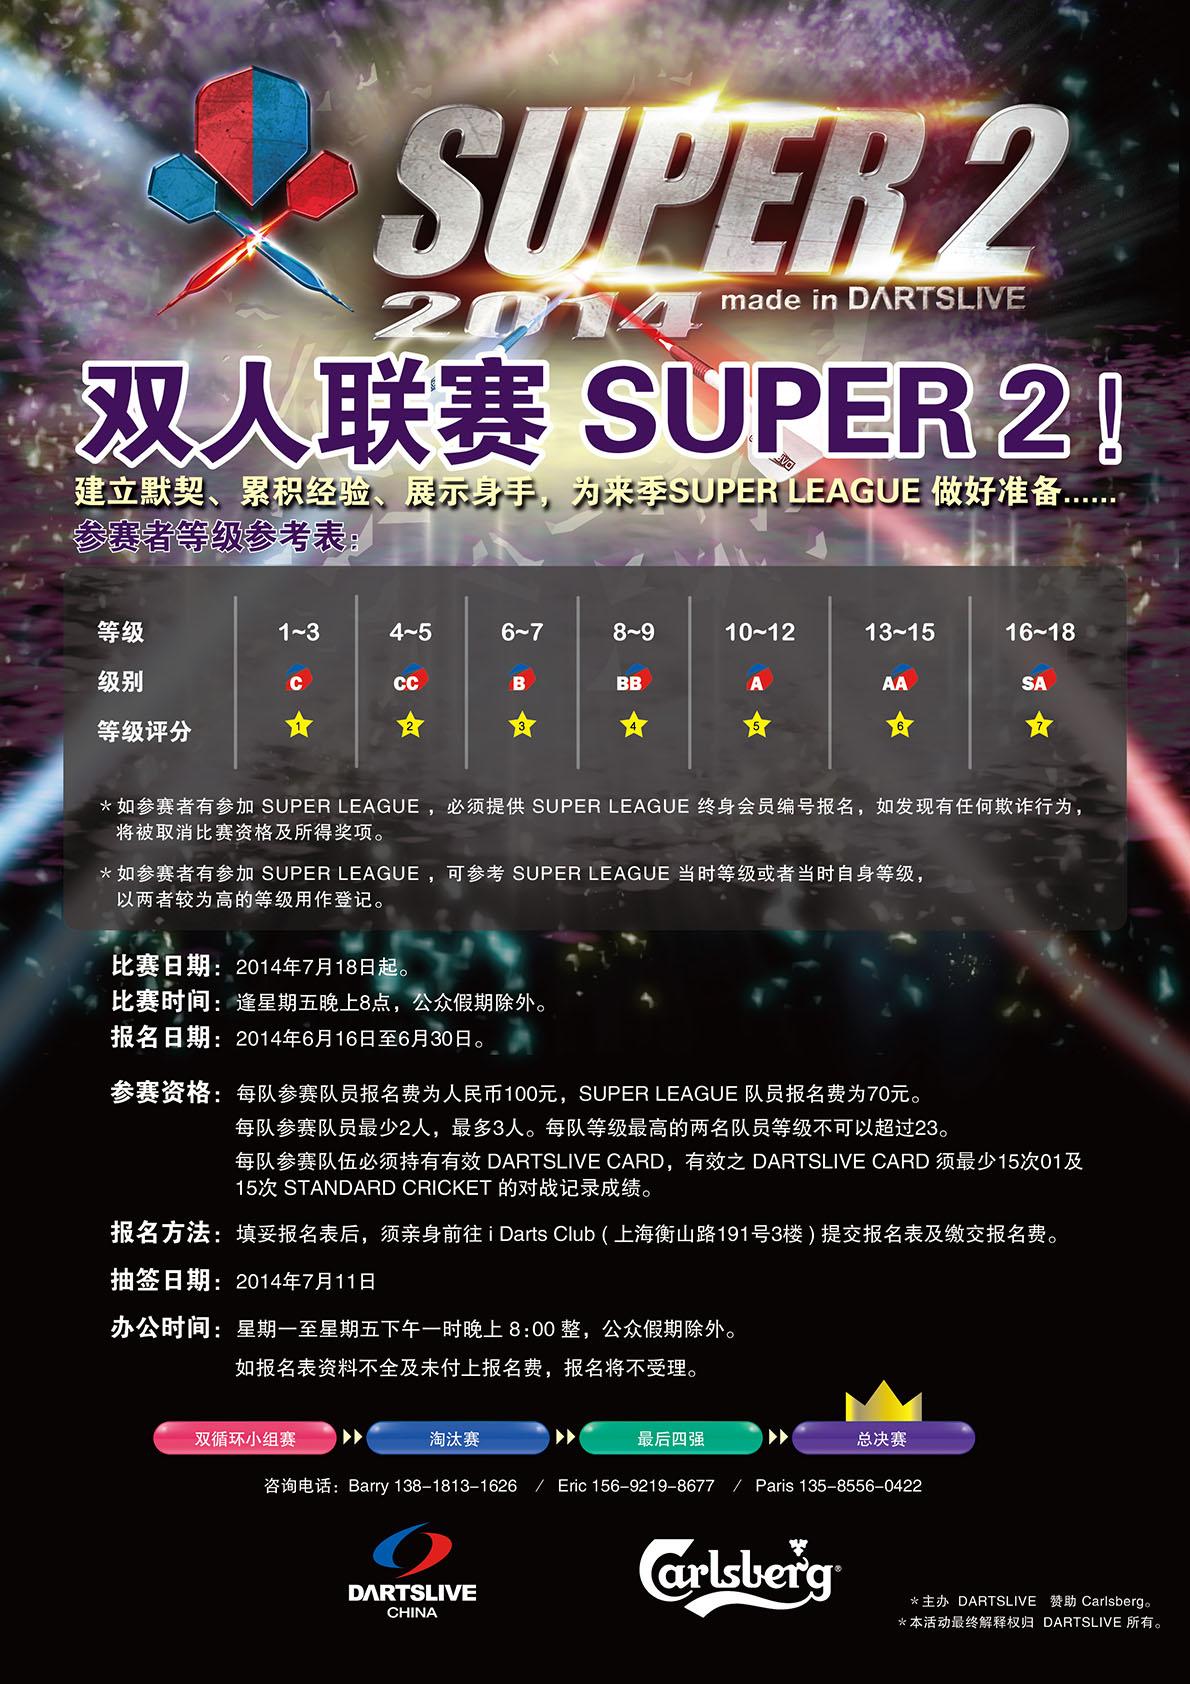 SUPER_2_Poster02_china-01-2.jpg